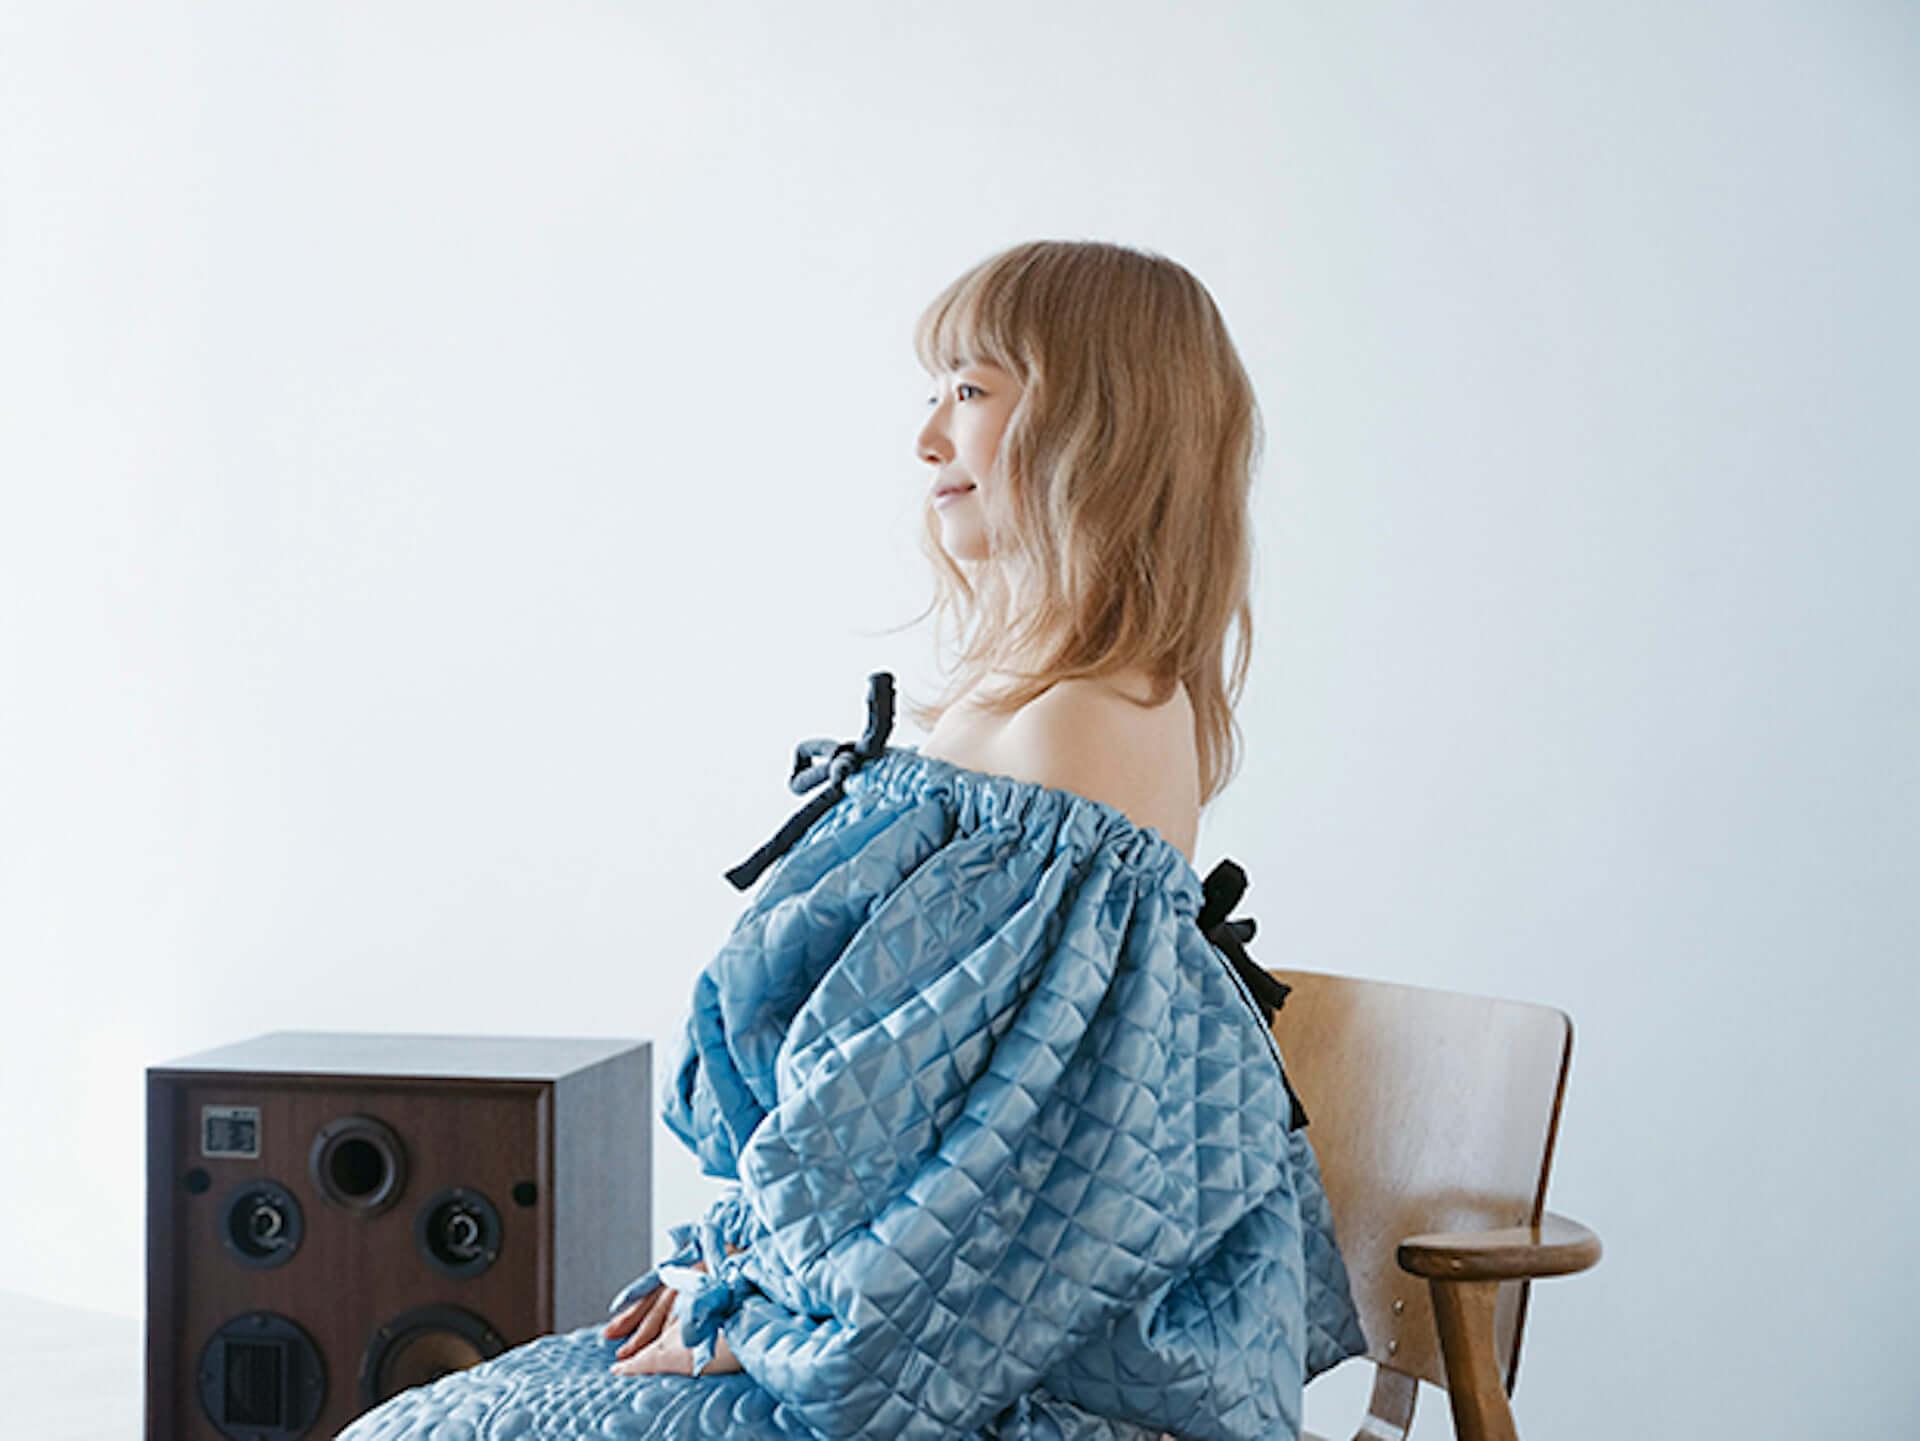 YUKIが約2年ぶりのニューアルバム『Terminal』をリリース決定!初回盤にはDVDが付属 music210303_yuki_2-1920x1441